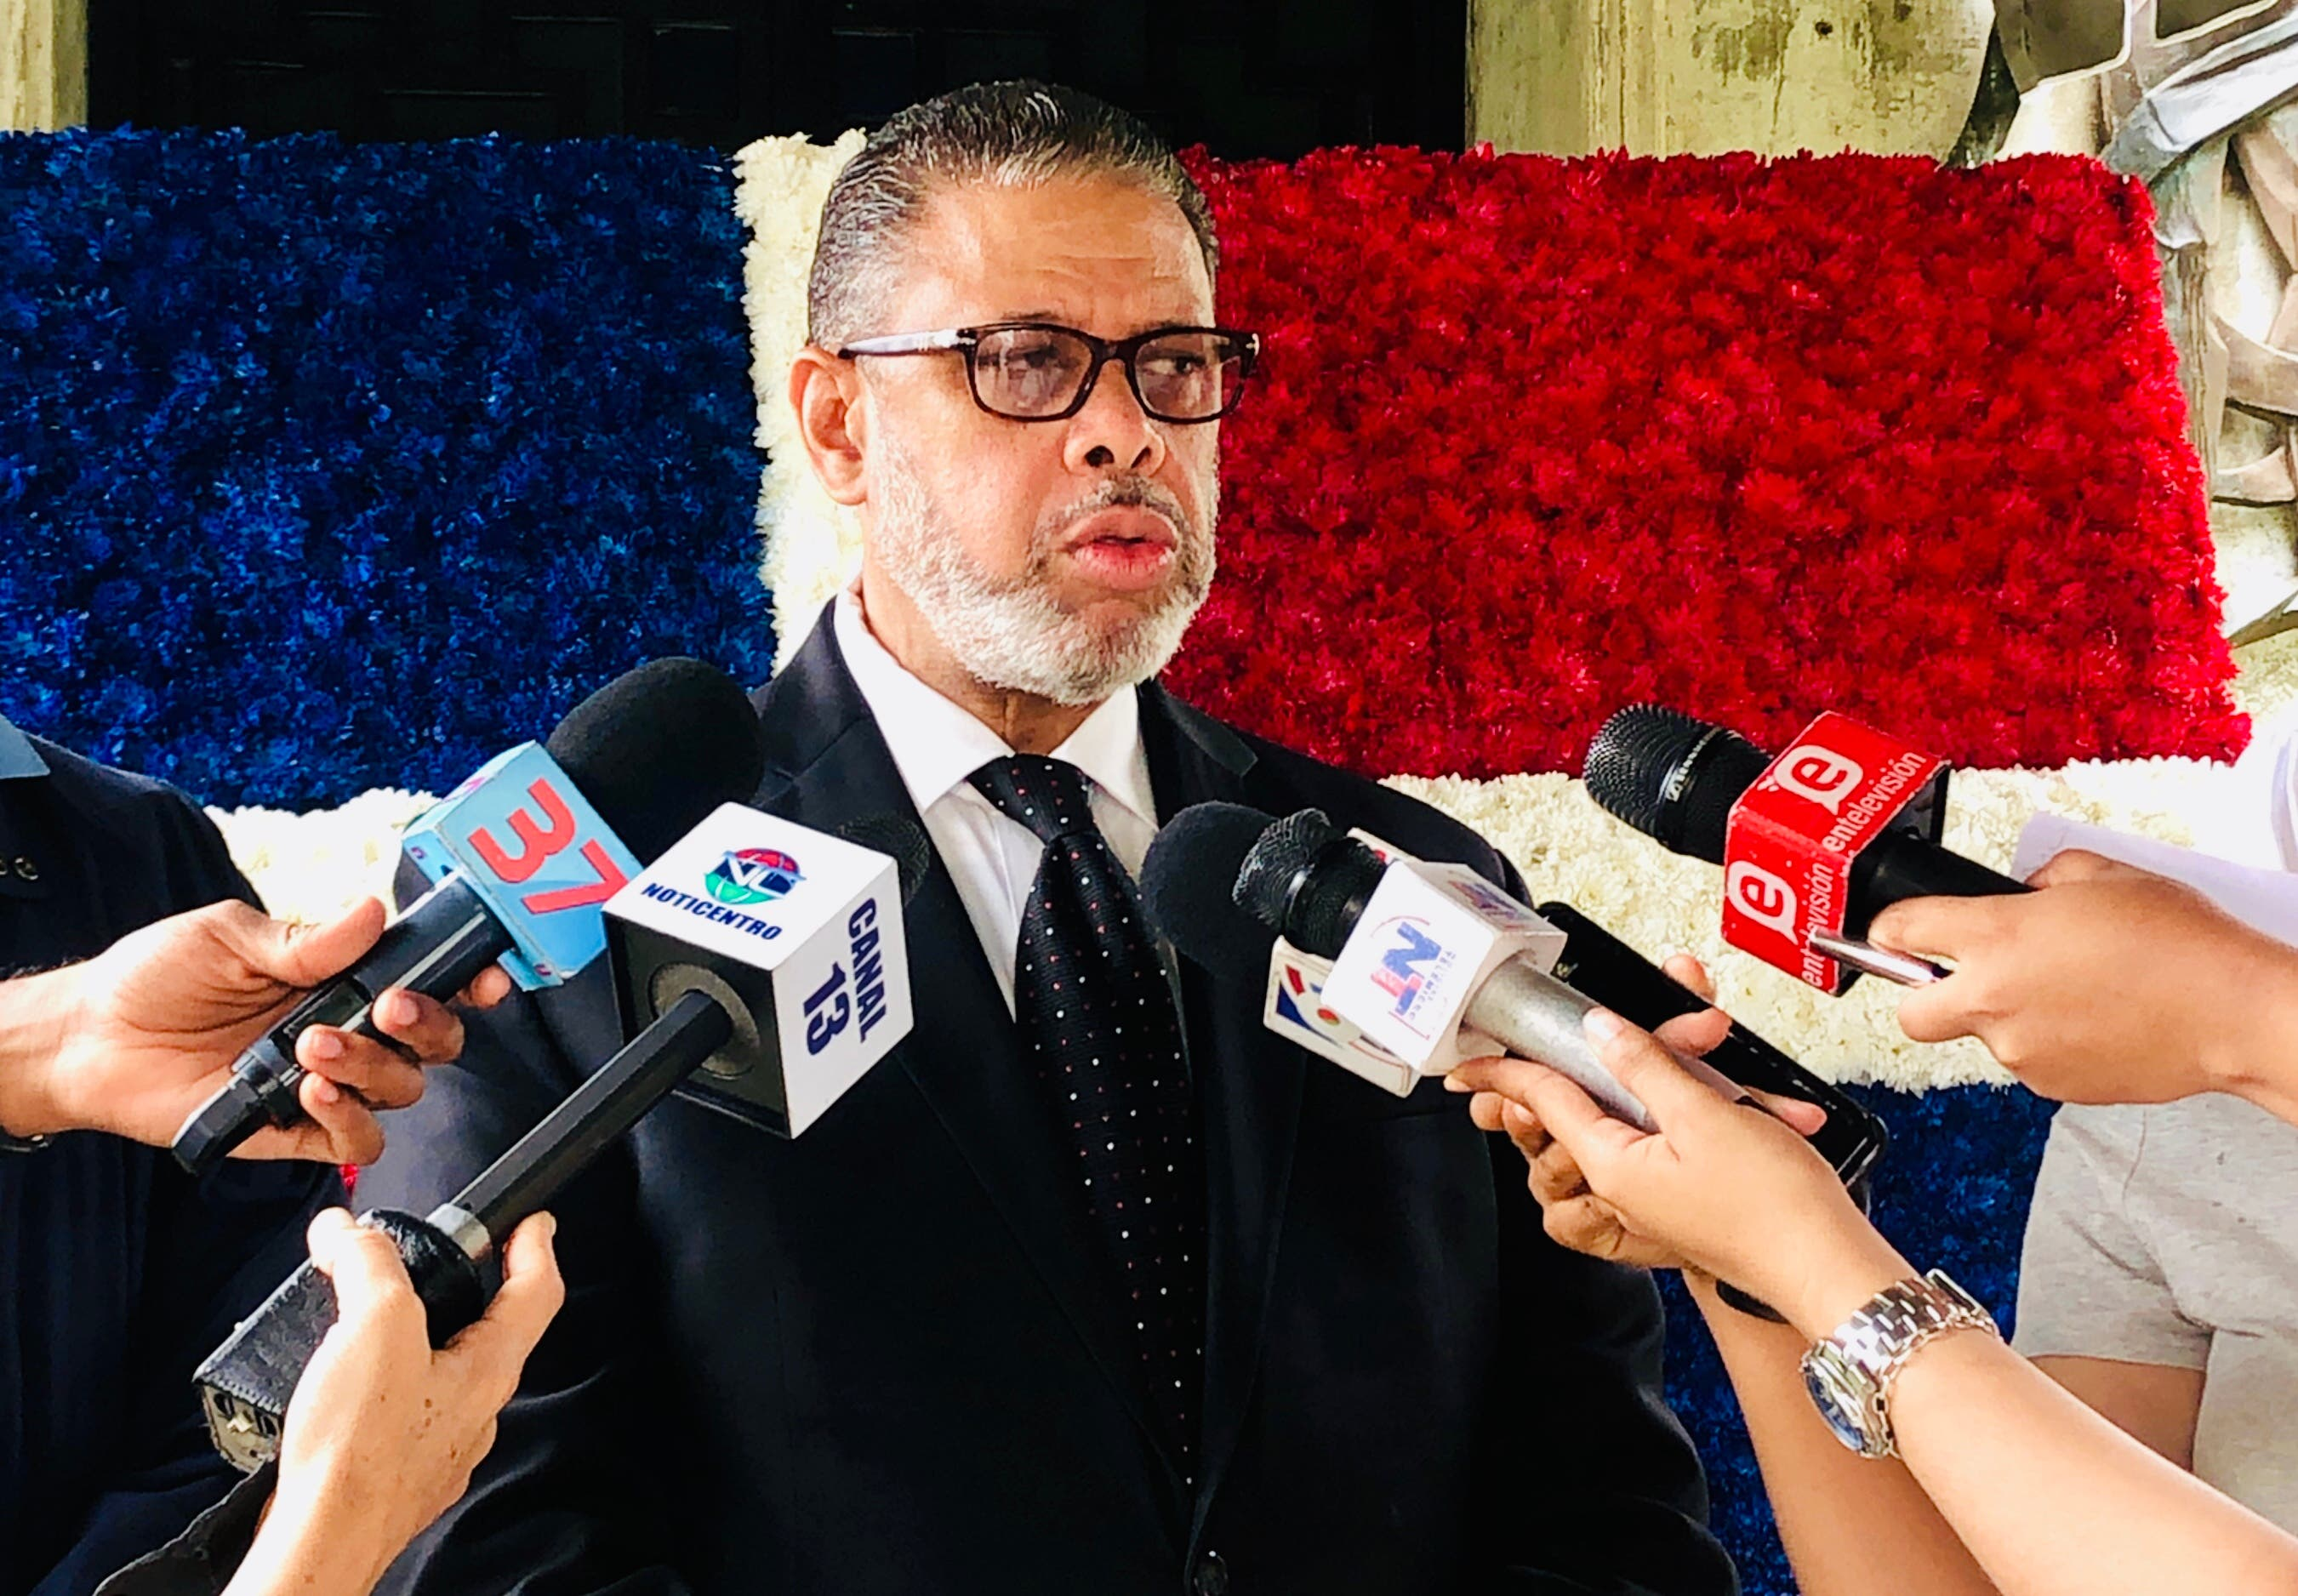 Modesto Guzmán afirma legado de Joaquín  Balaguer aún beneficia a la sociedad dominicana por  lo que siempre será recordado